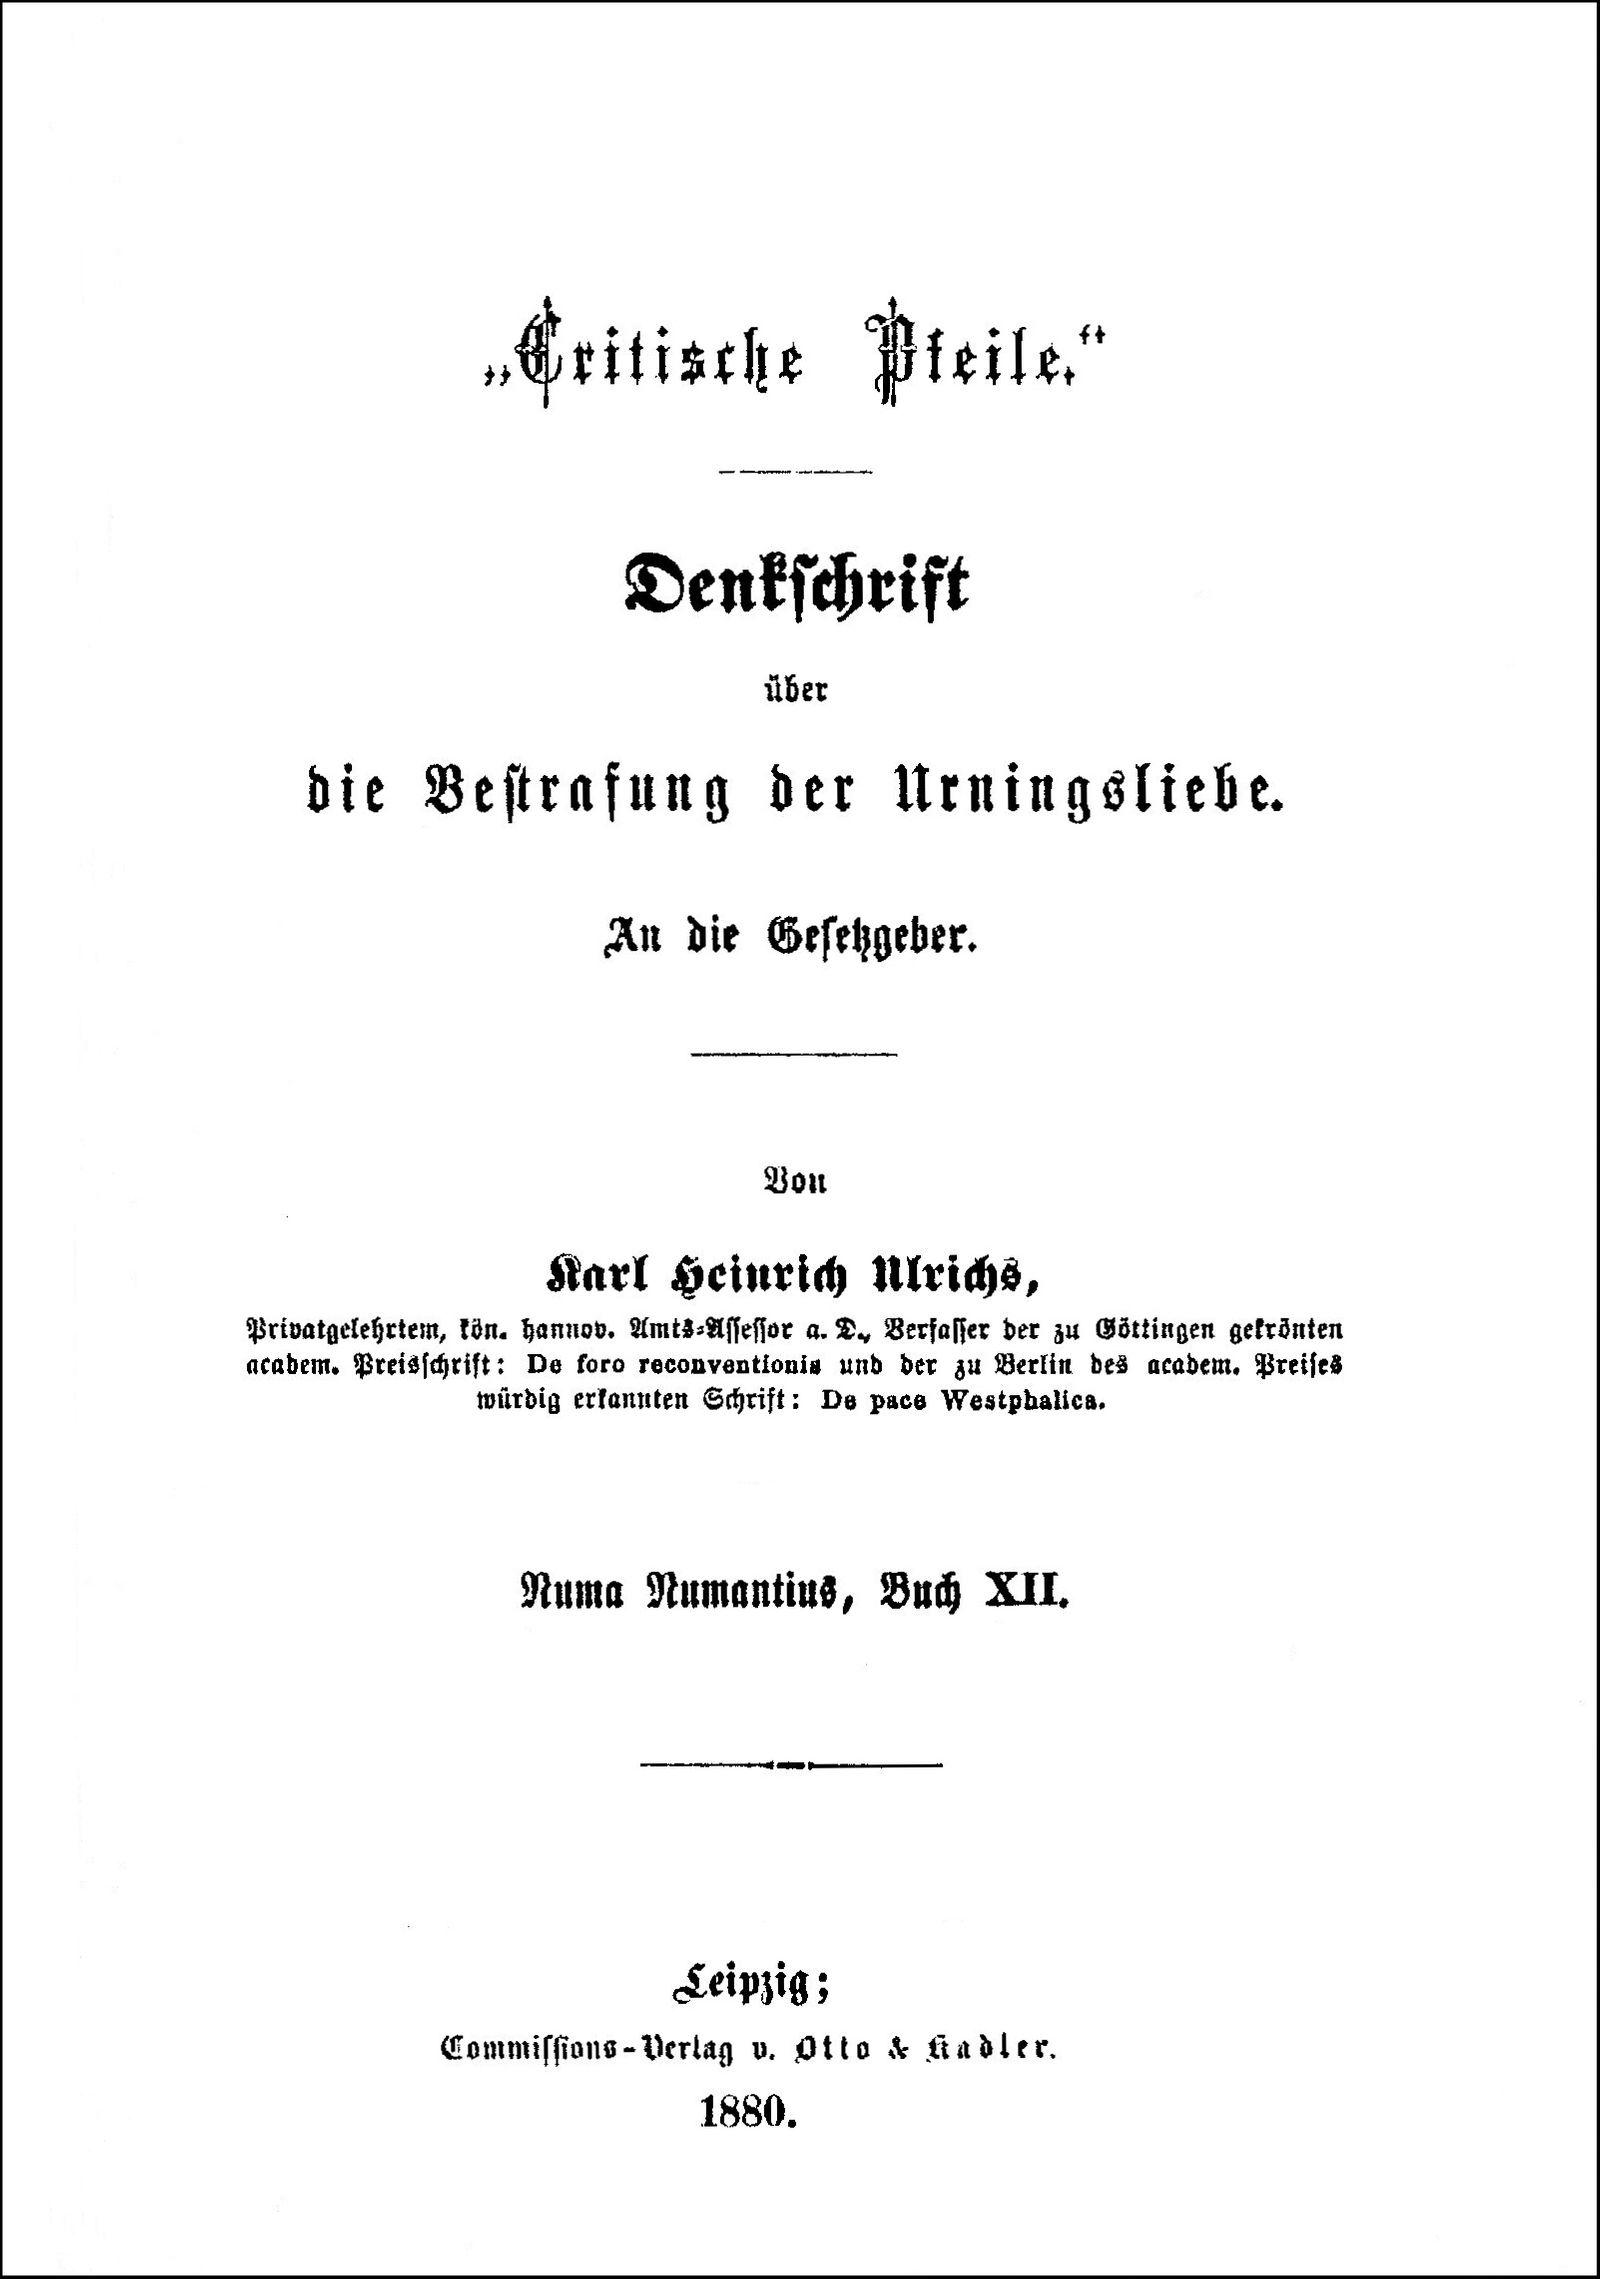 Titlepage of Ulrichs' Critische Pfeile, 1880